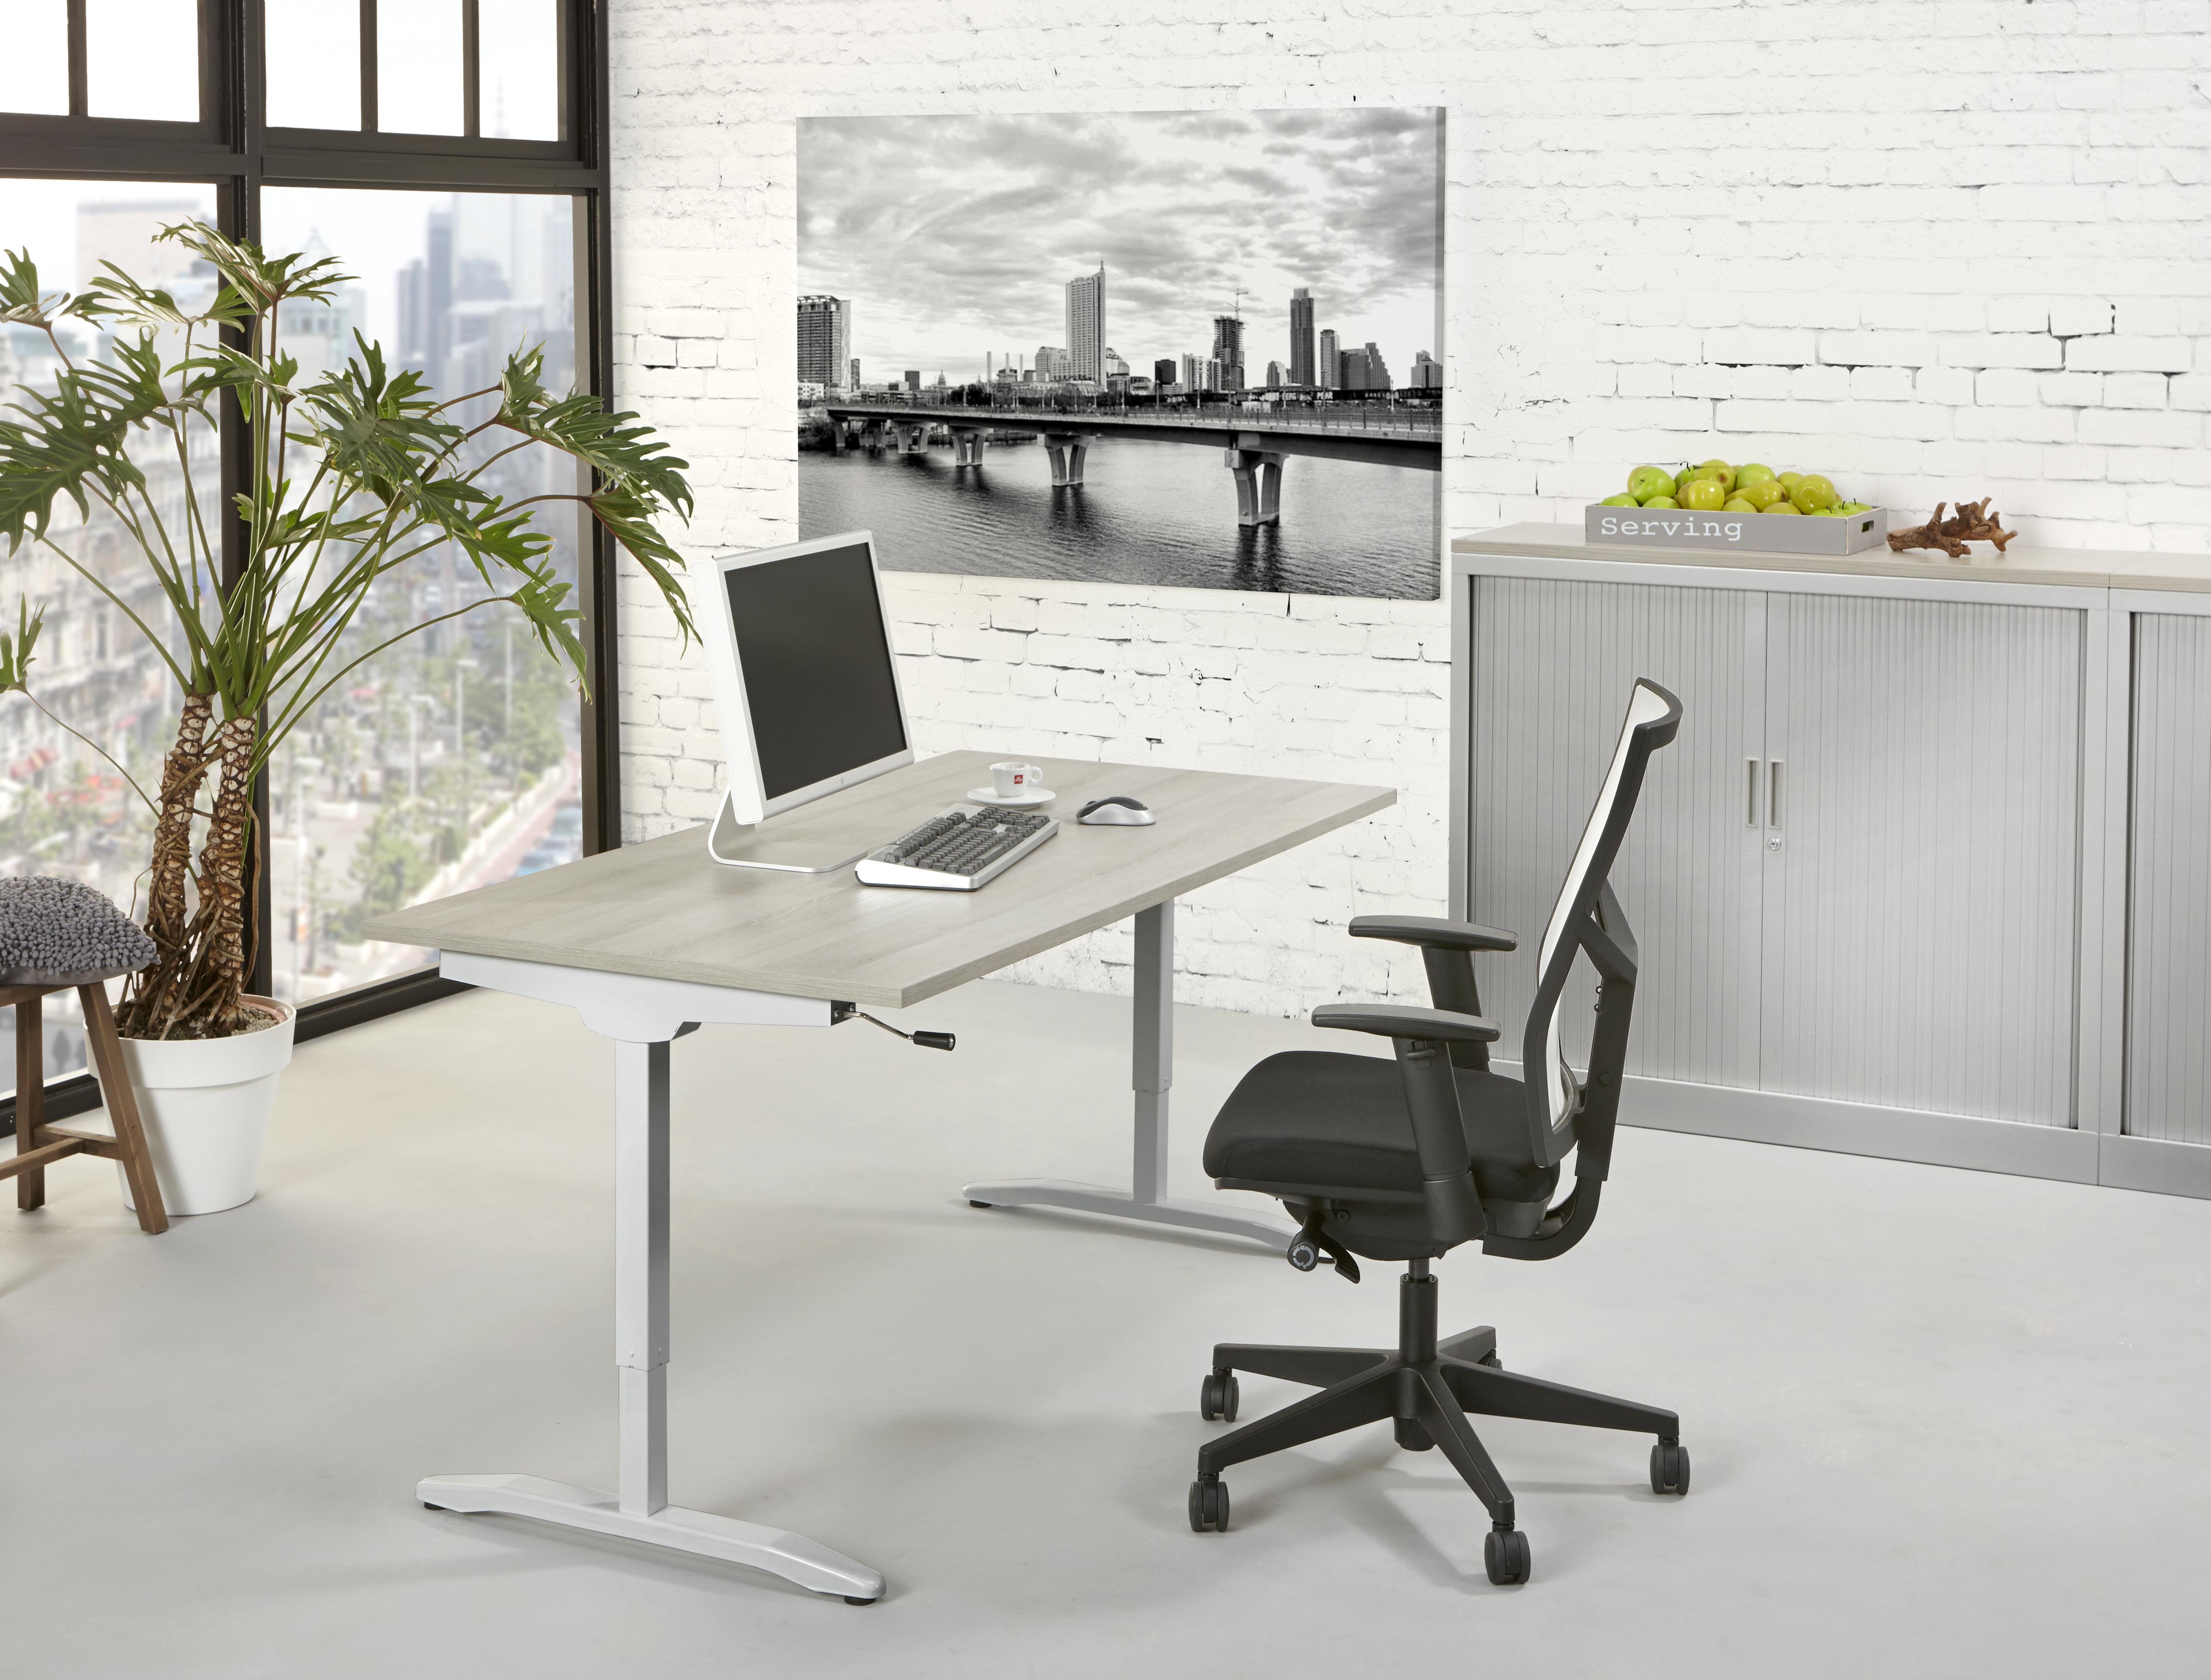 Wonderlijk Moderne kantoorinrichting - Kantoormeubelen.PRO QY-56